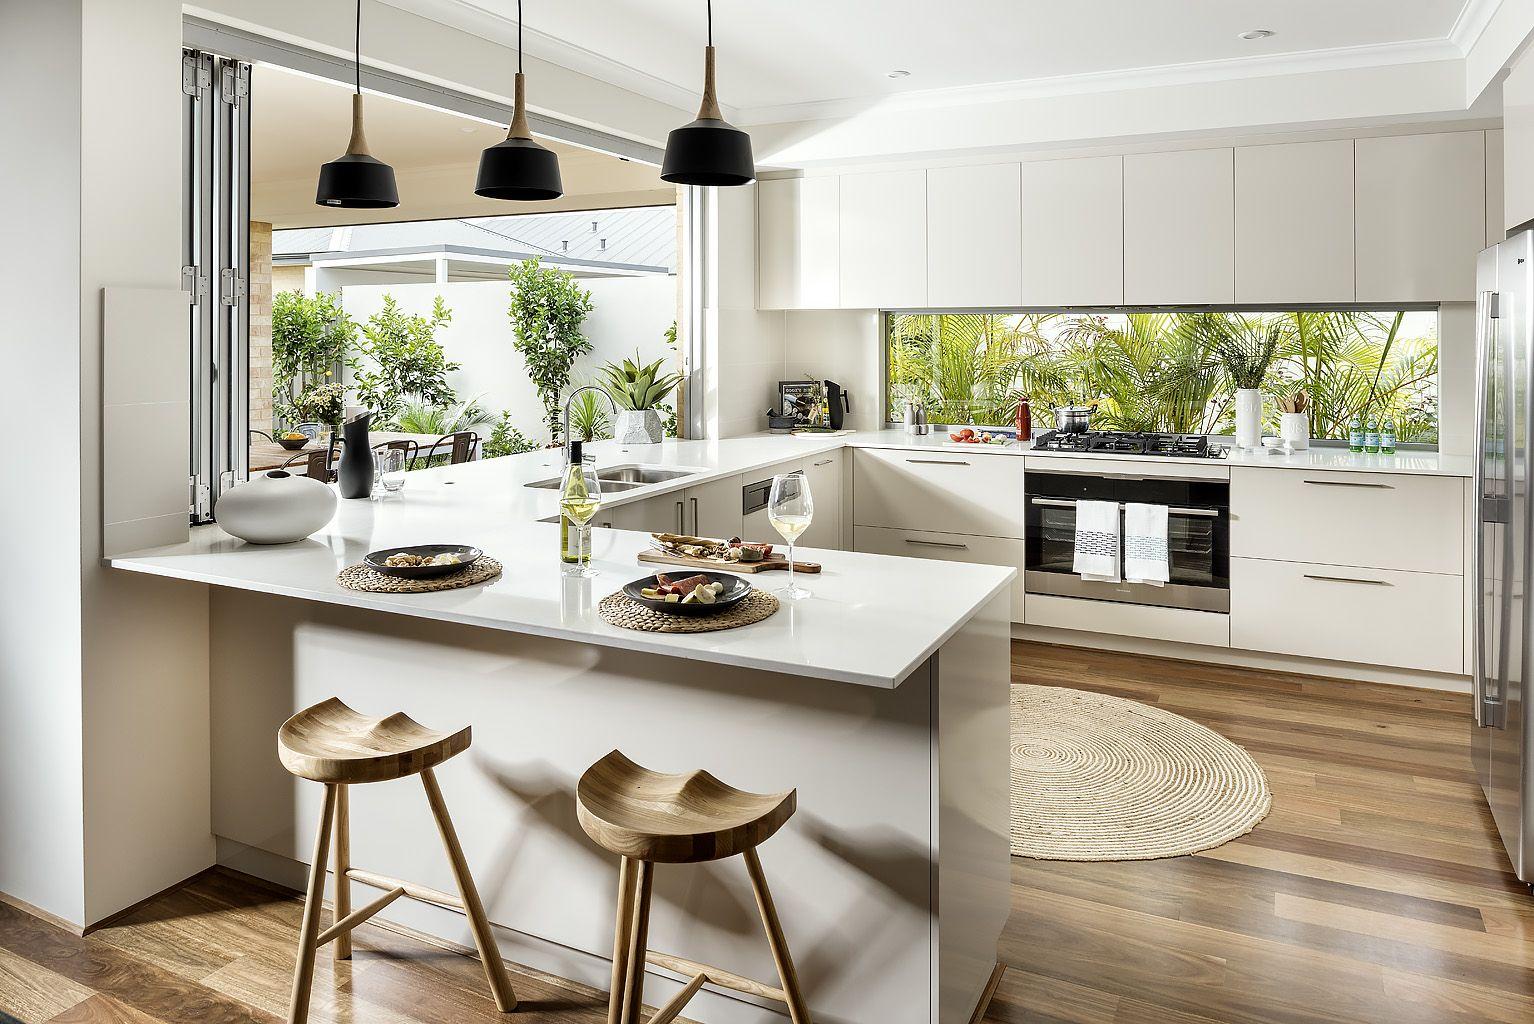 Servery window* White modern kitchen with glass window splash back ...